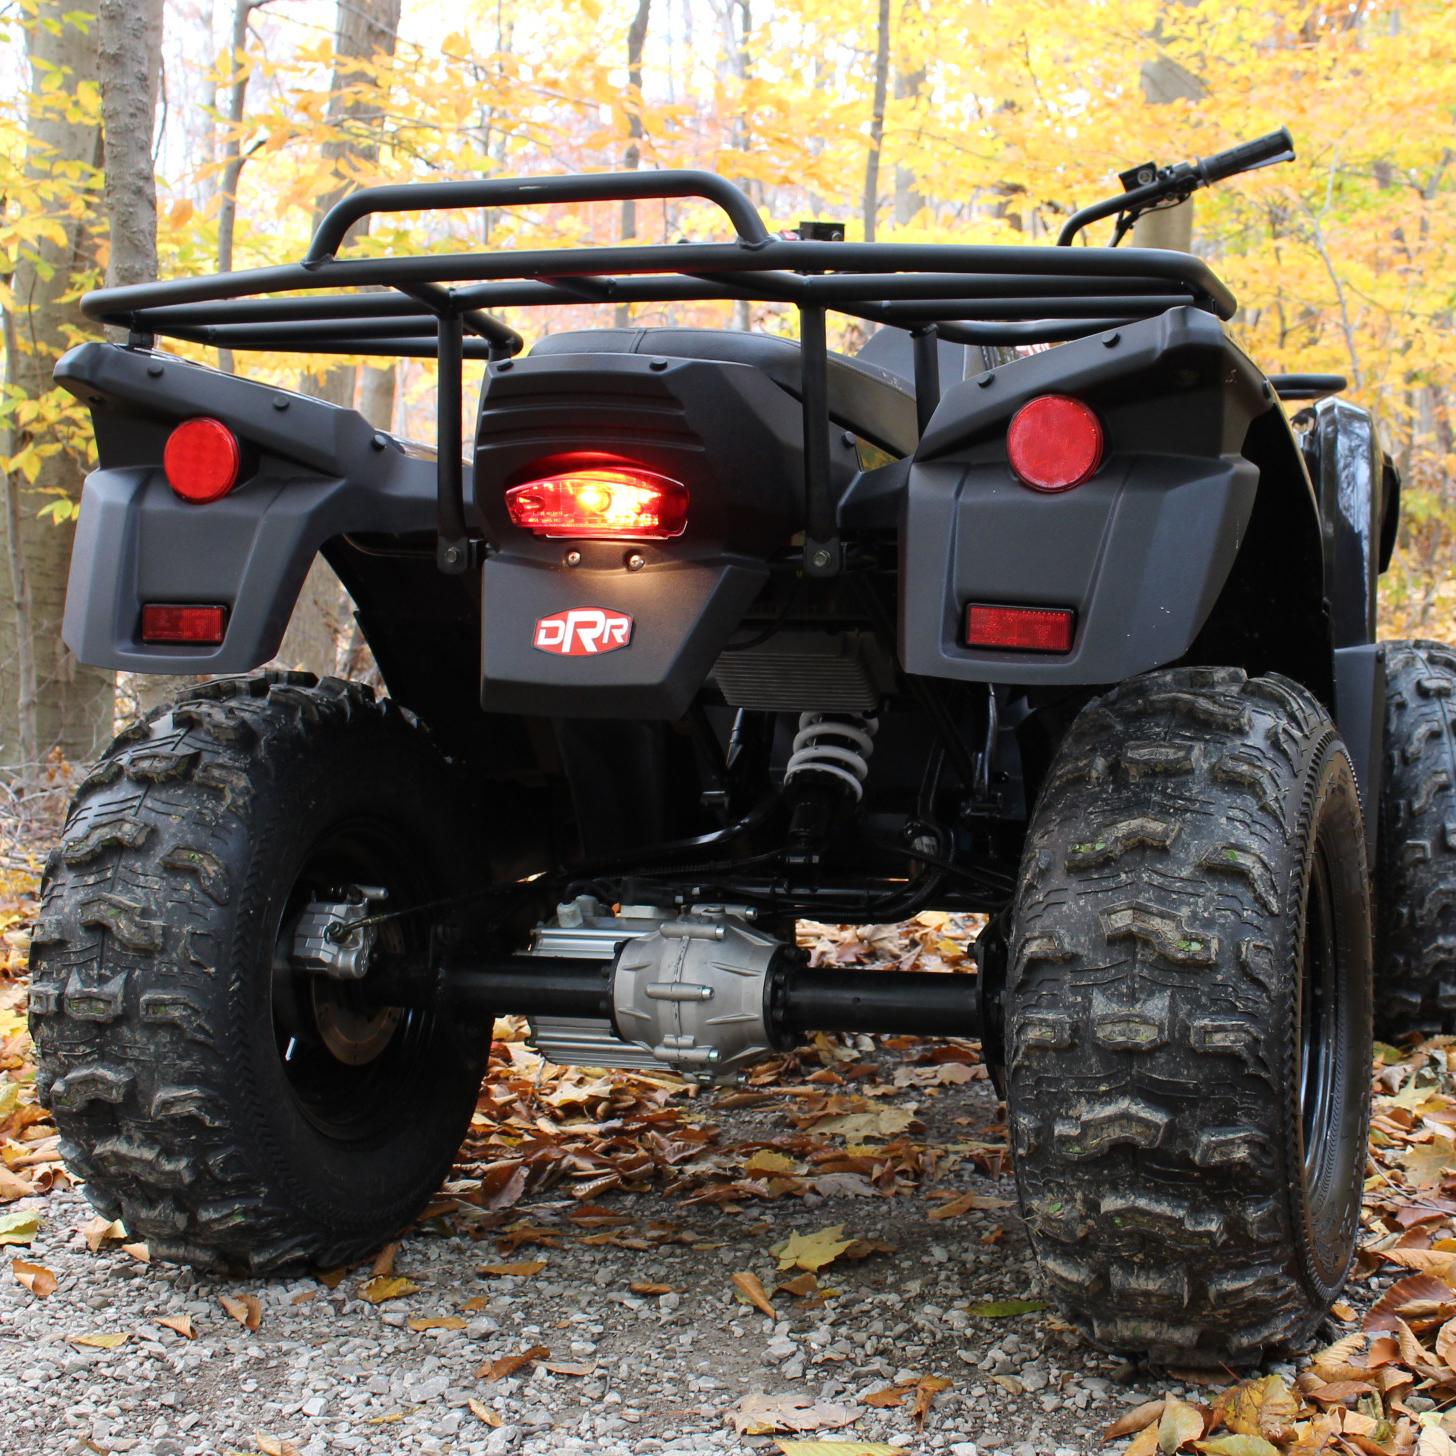 DRR USA Stealth Electric ATV Rear.jpg